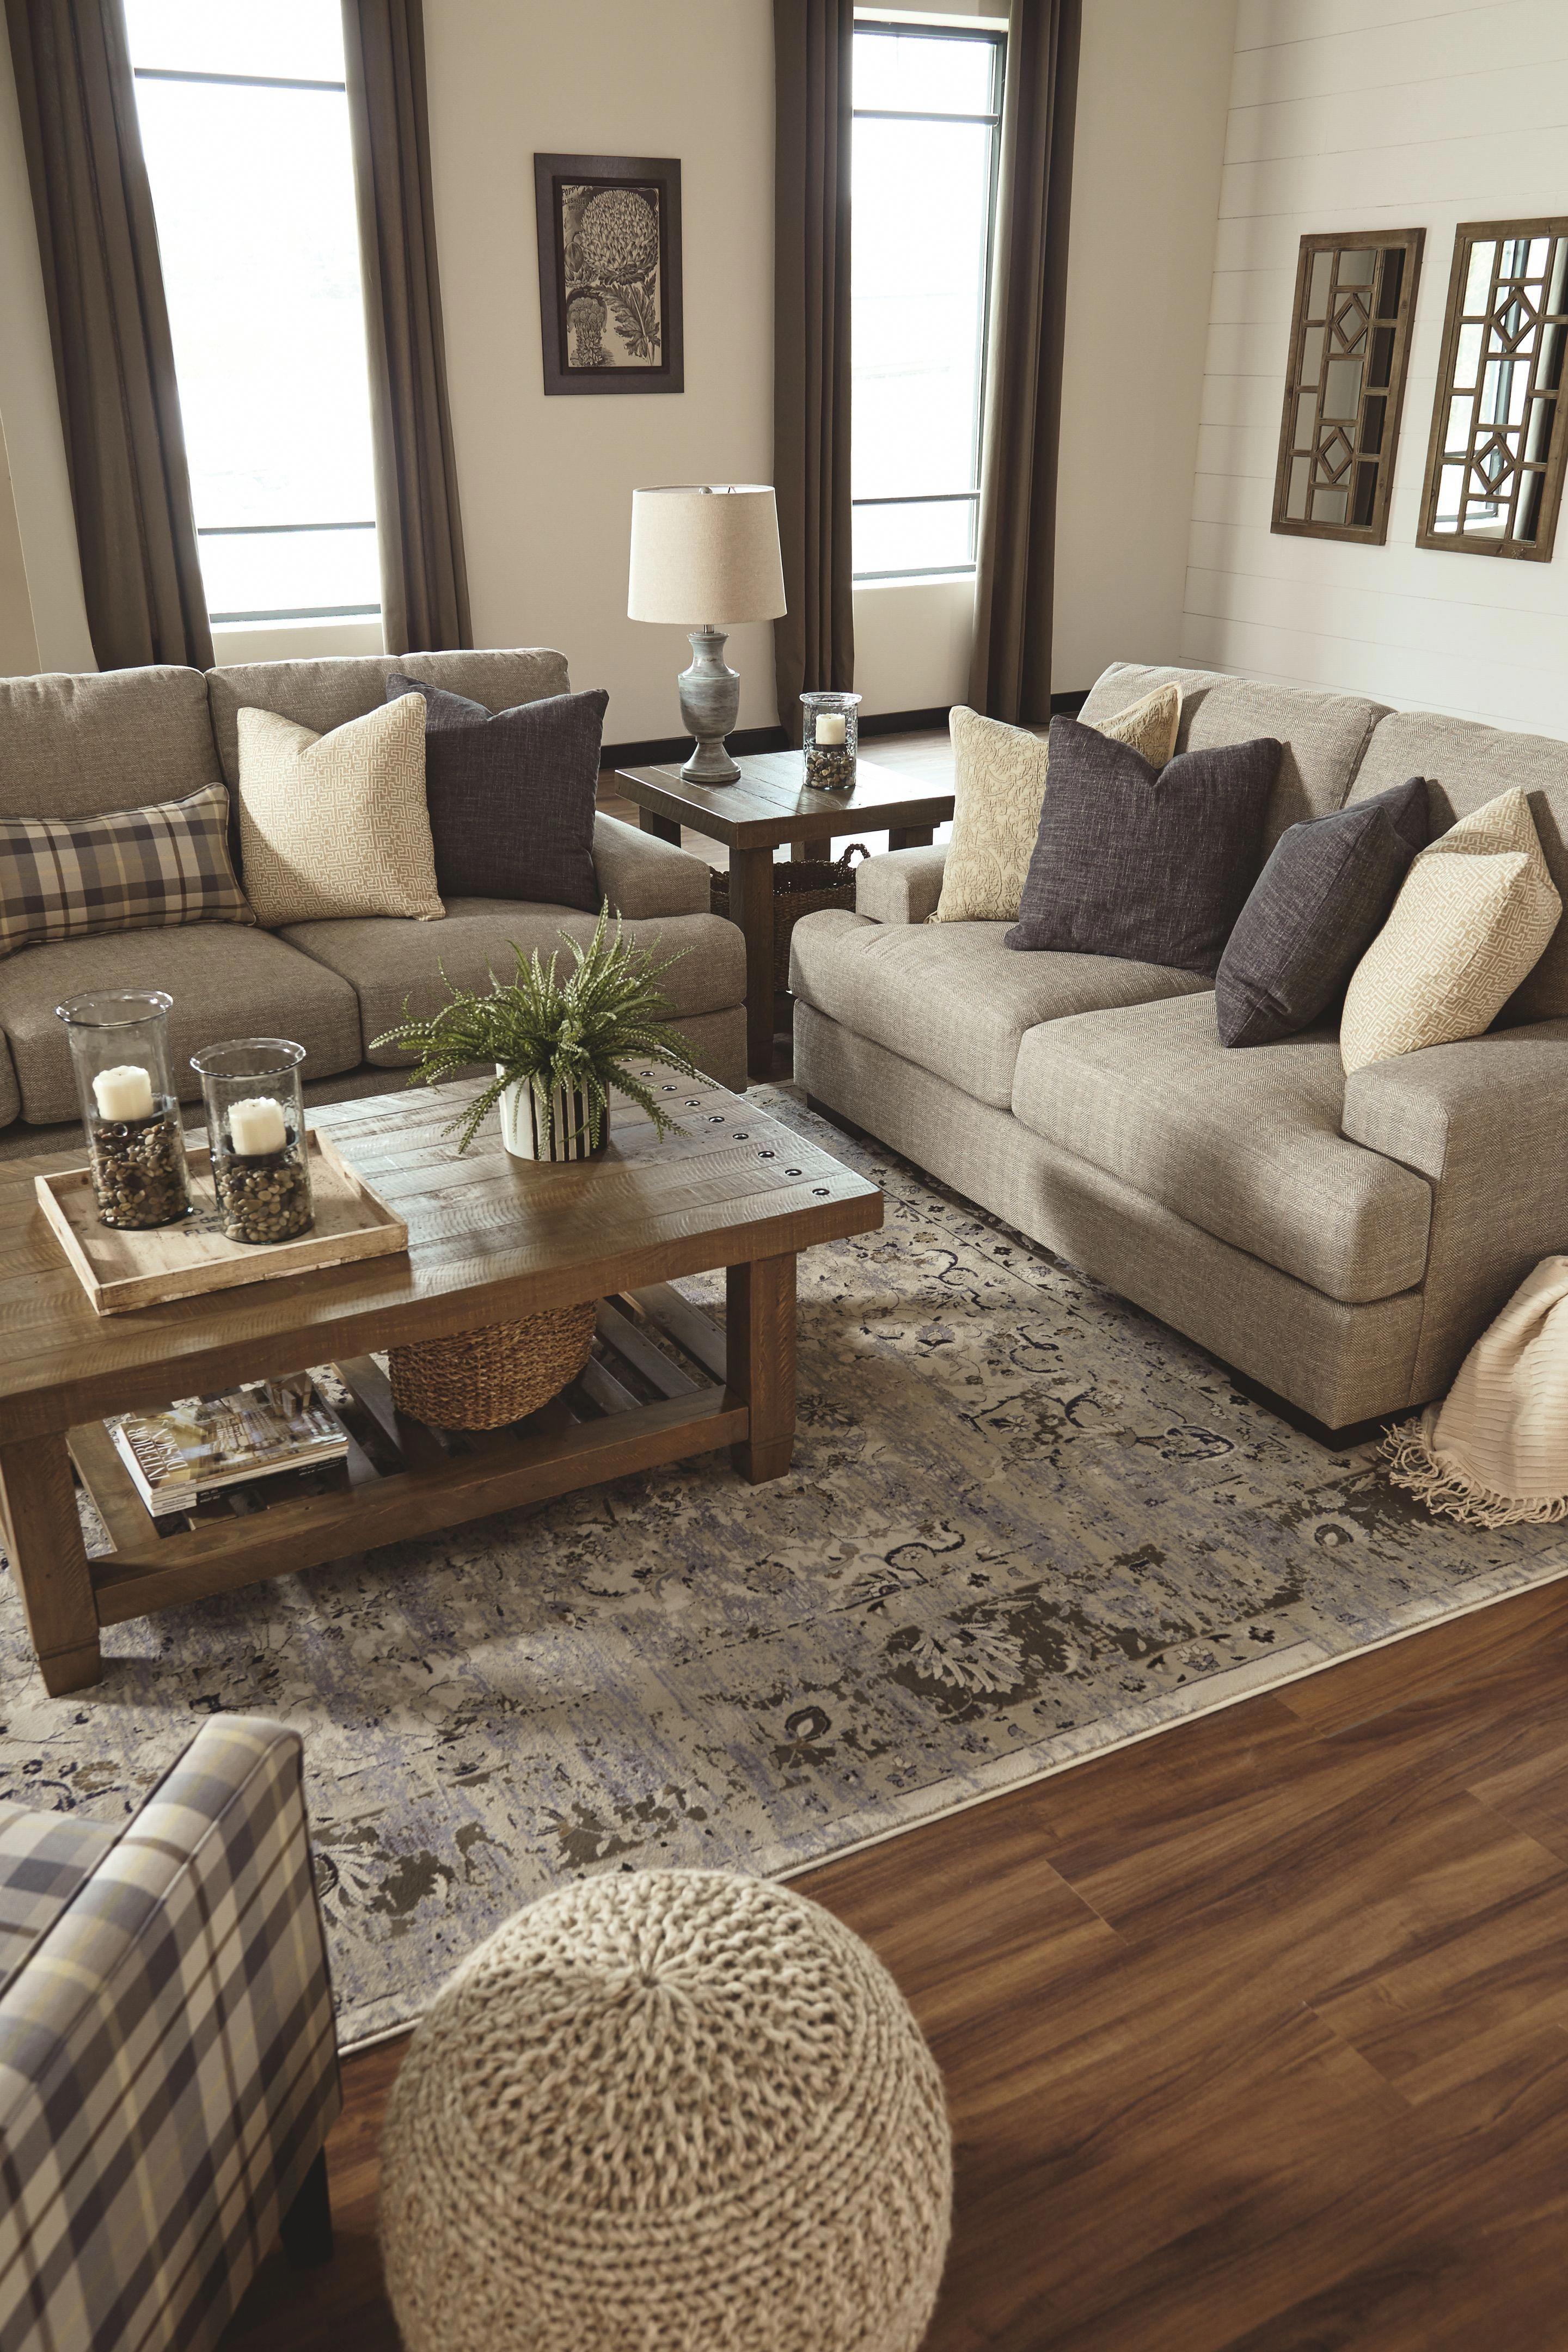 Cozy all white living room decor rustic farmhouse